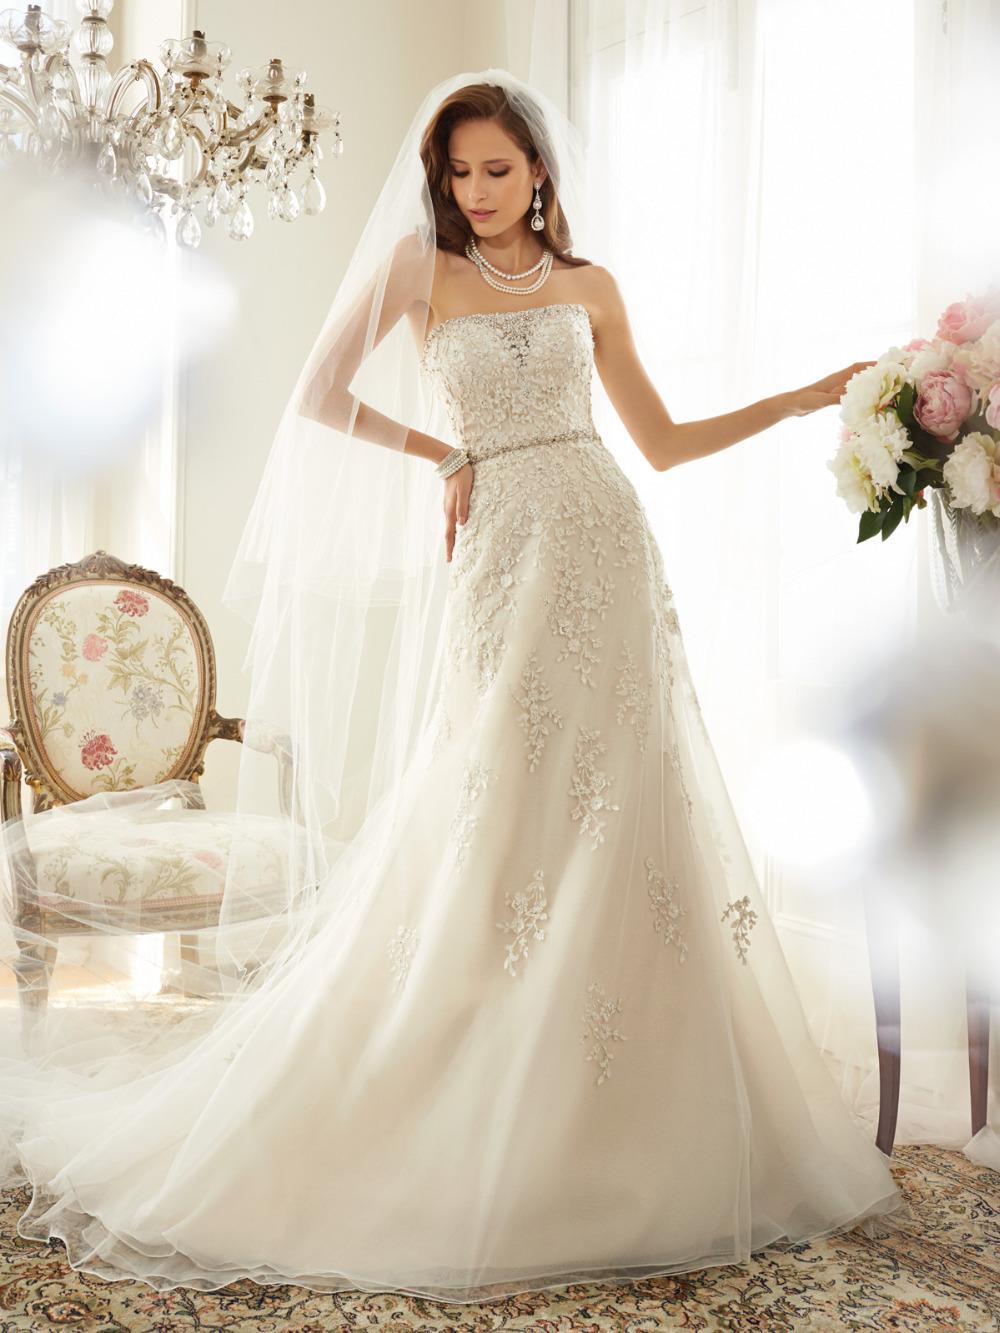 High Fashion Civil Wedding Dresses 2015 Strapless Lace